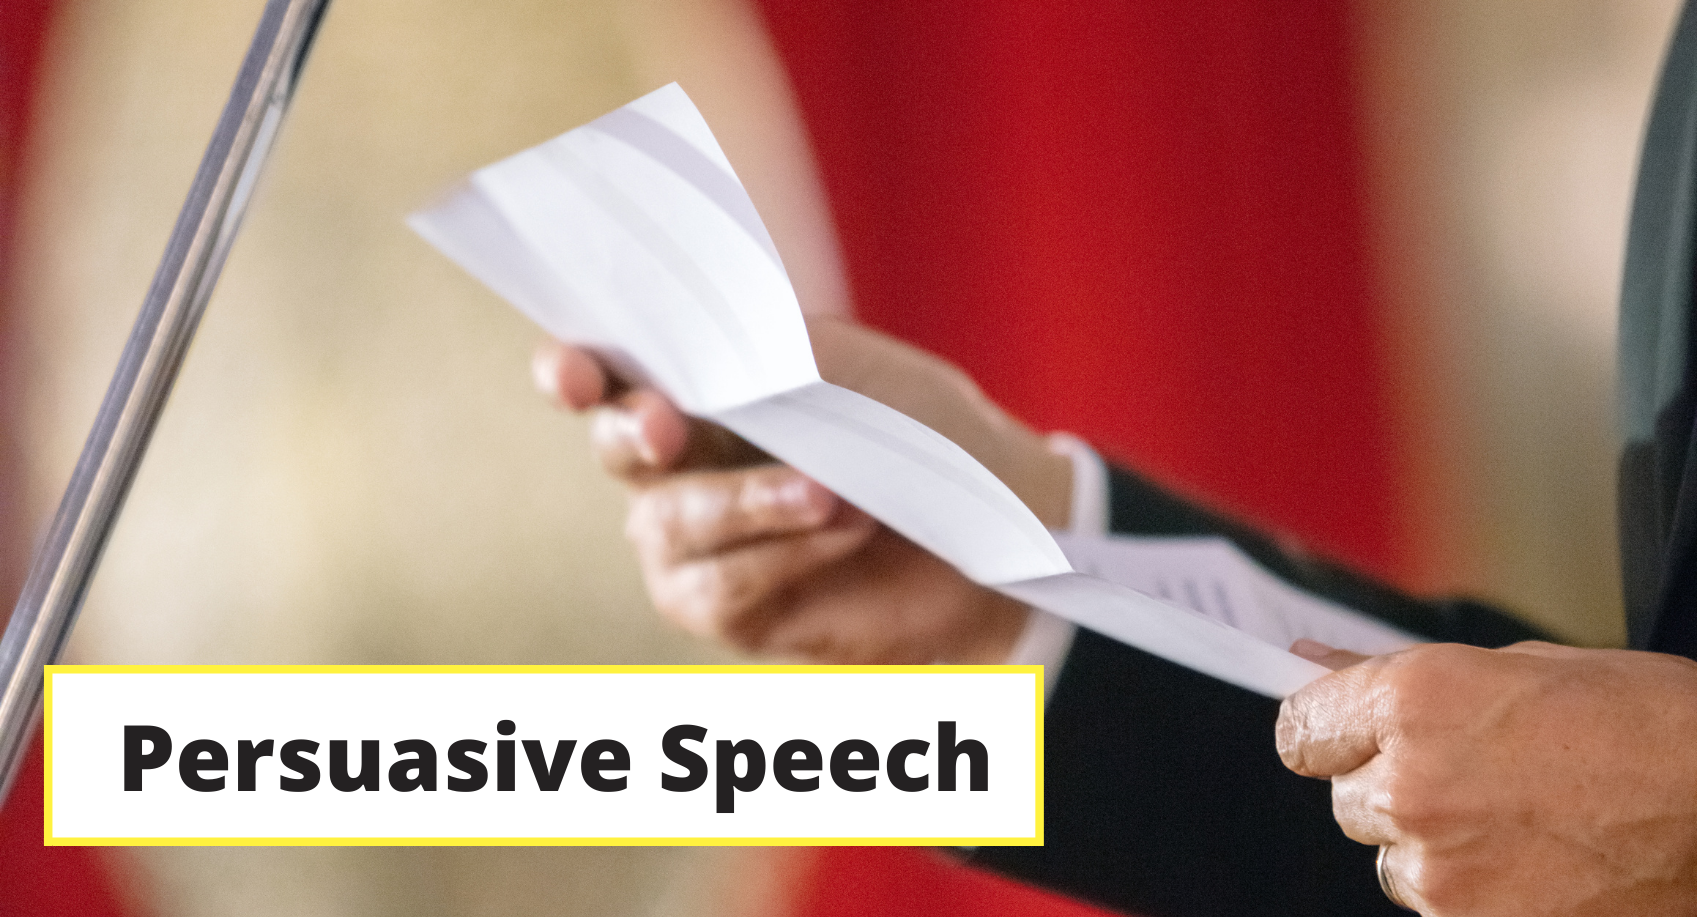 50 Best Persuasive Speech Essay topics ideas and writing tips